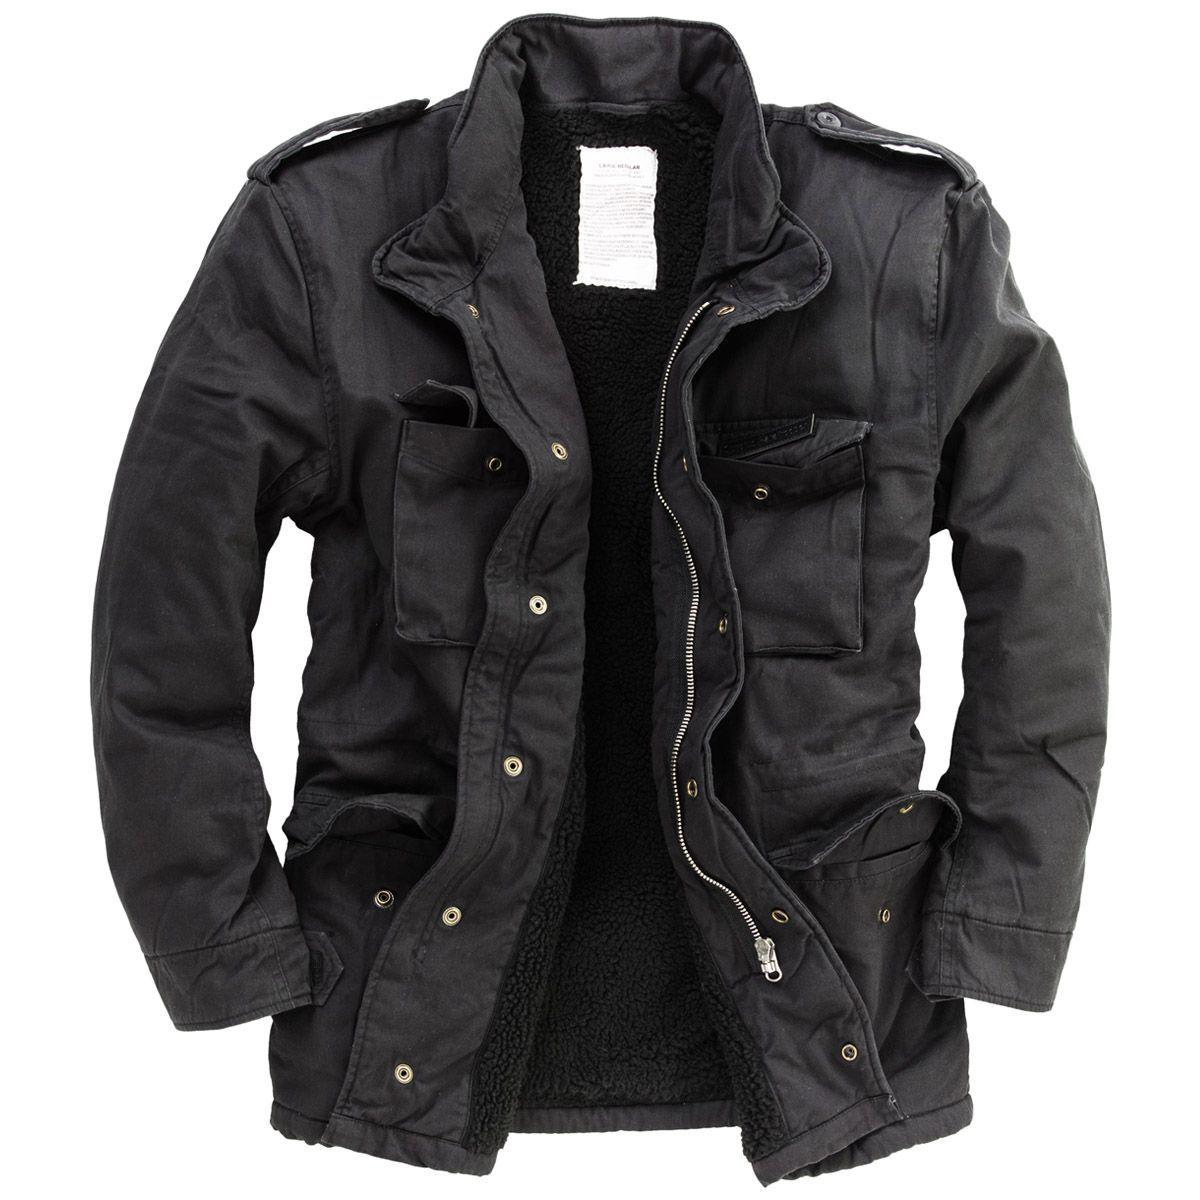 Teesar Tactical Smock Generation II Military Mens Jacket Army Hooded Coat Black